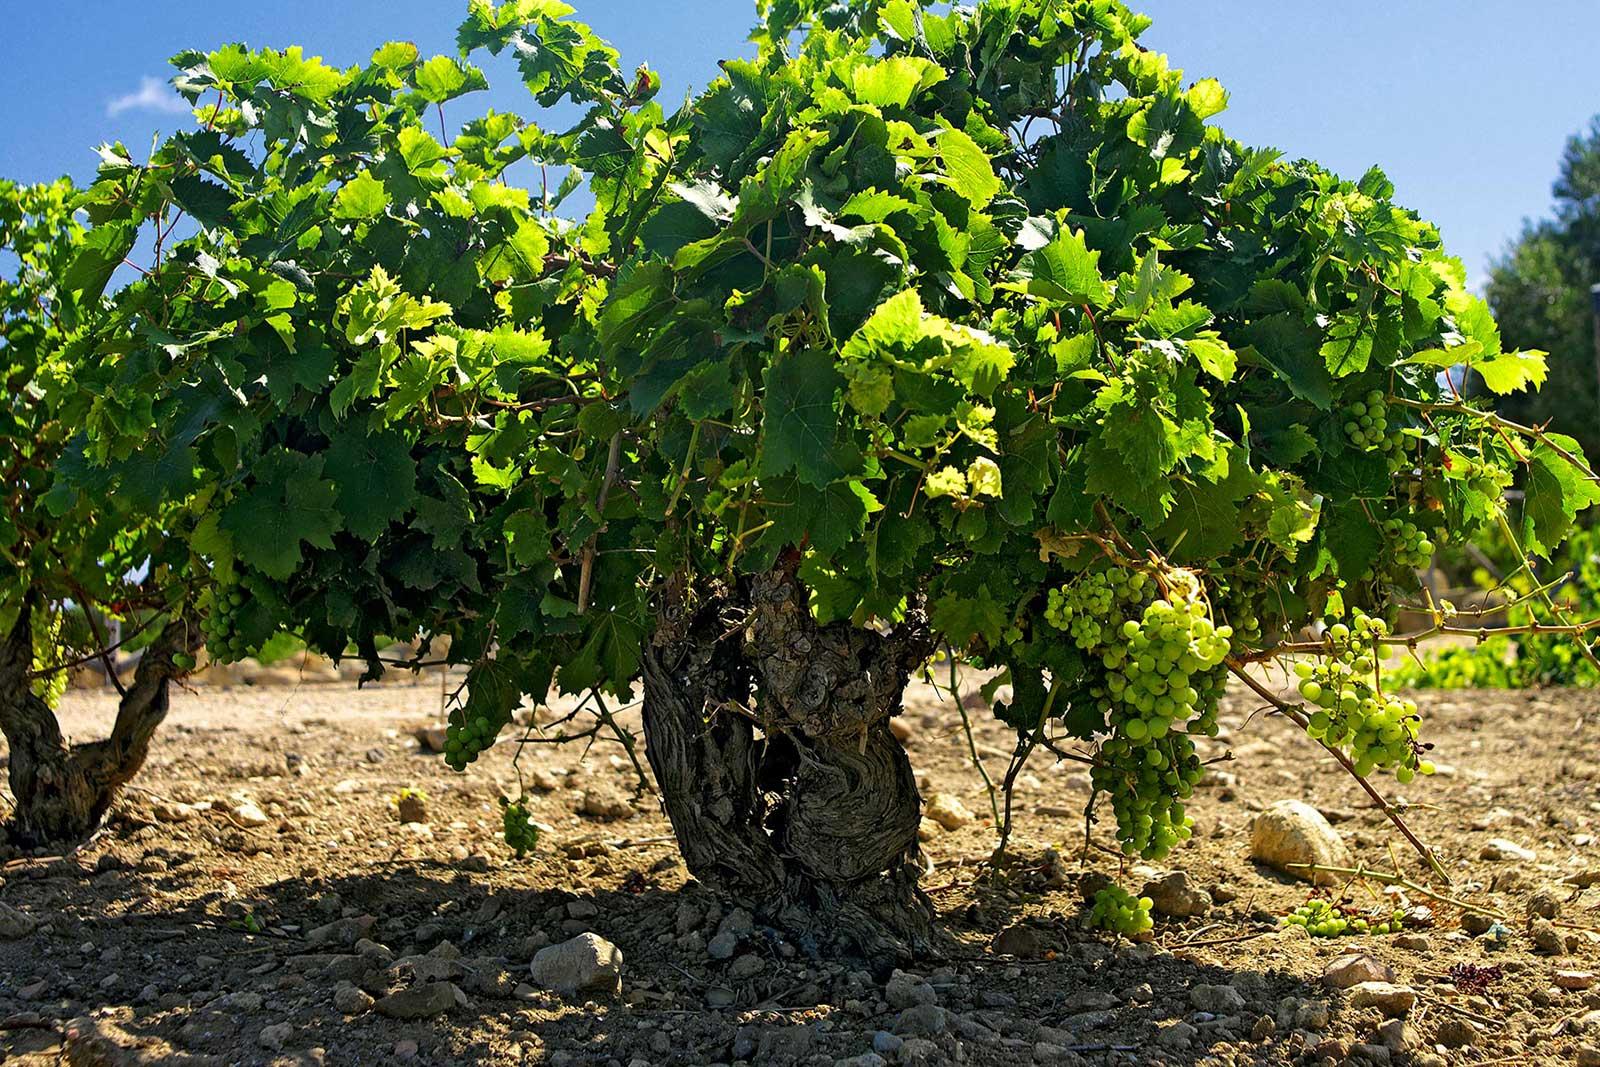 One of the old Grillo vines in the Mozia vineyard. ©Tasca d'Almerita